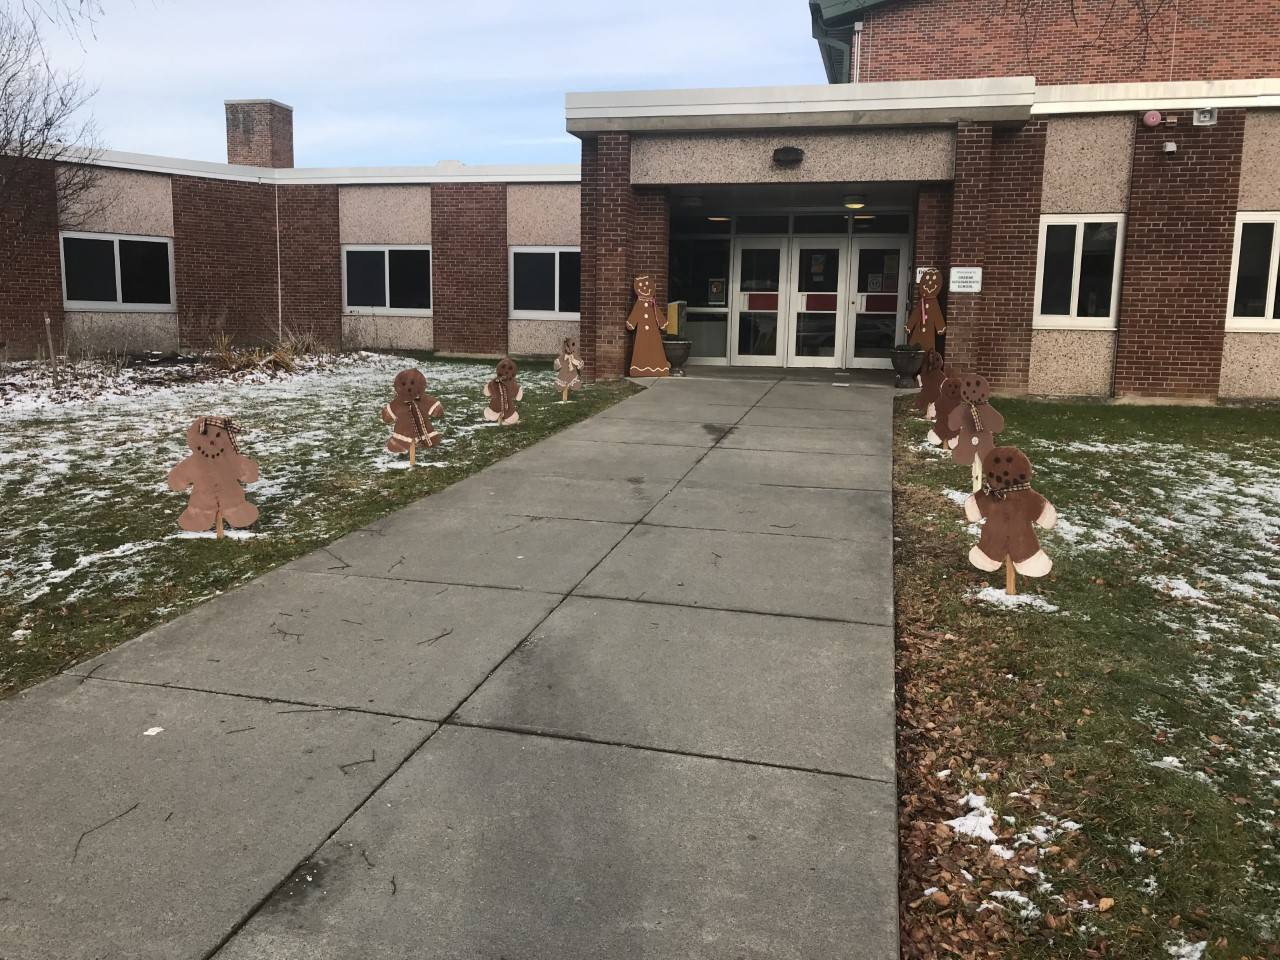 Photo of gingerbread people in front of Intermediate School